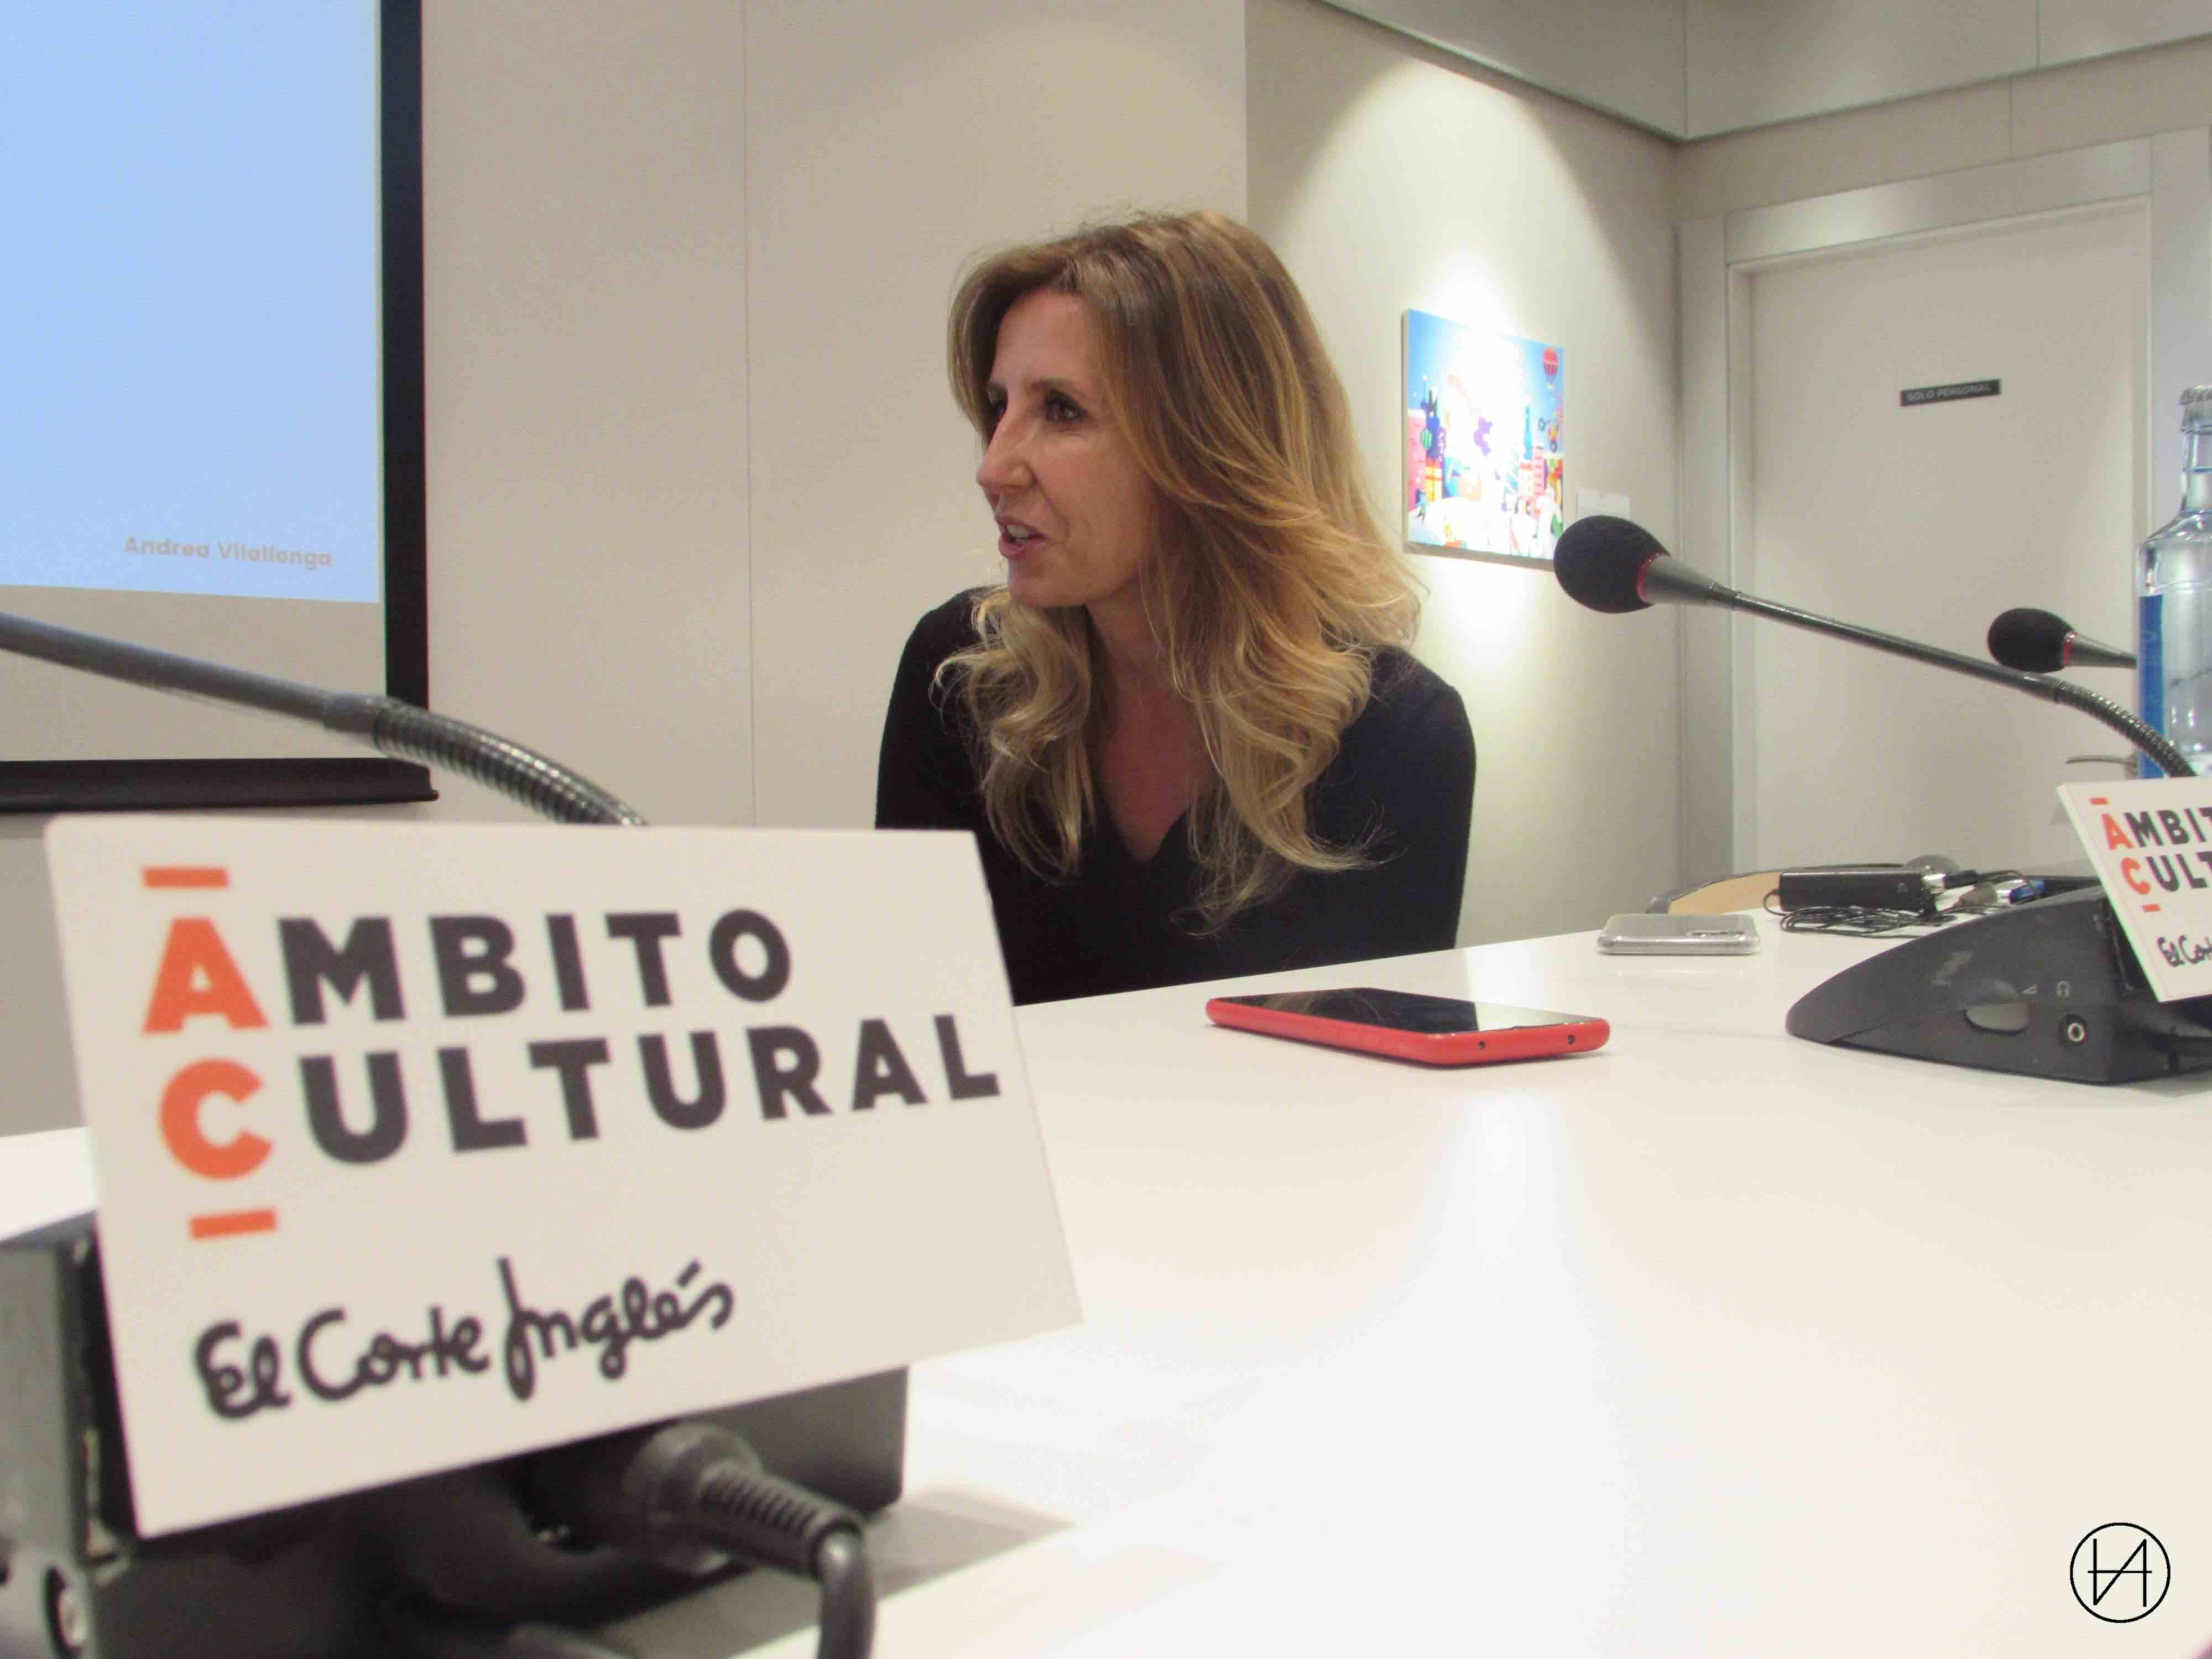 Andrea Villalonga, en un momento de la presentación en Zaragoza.